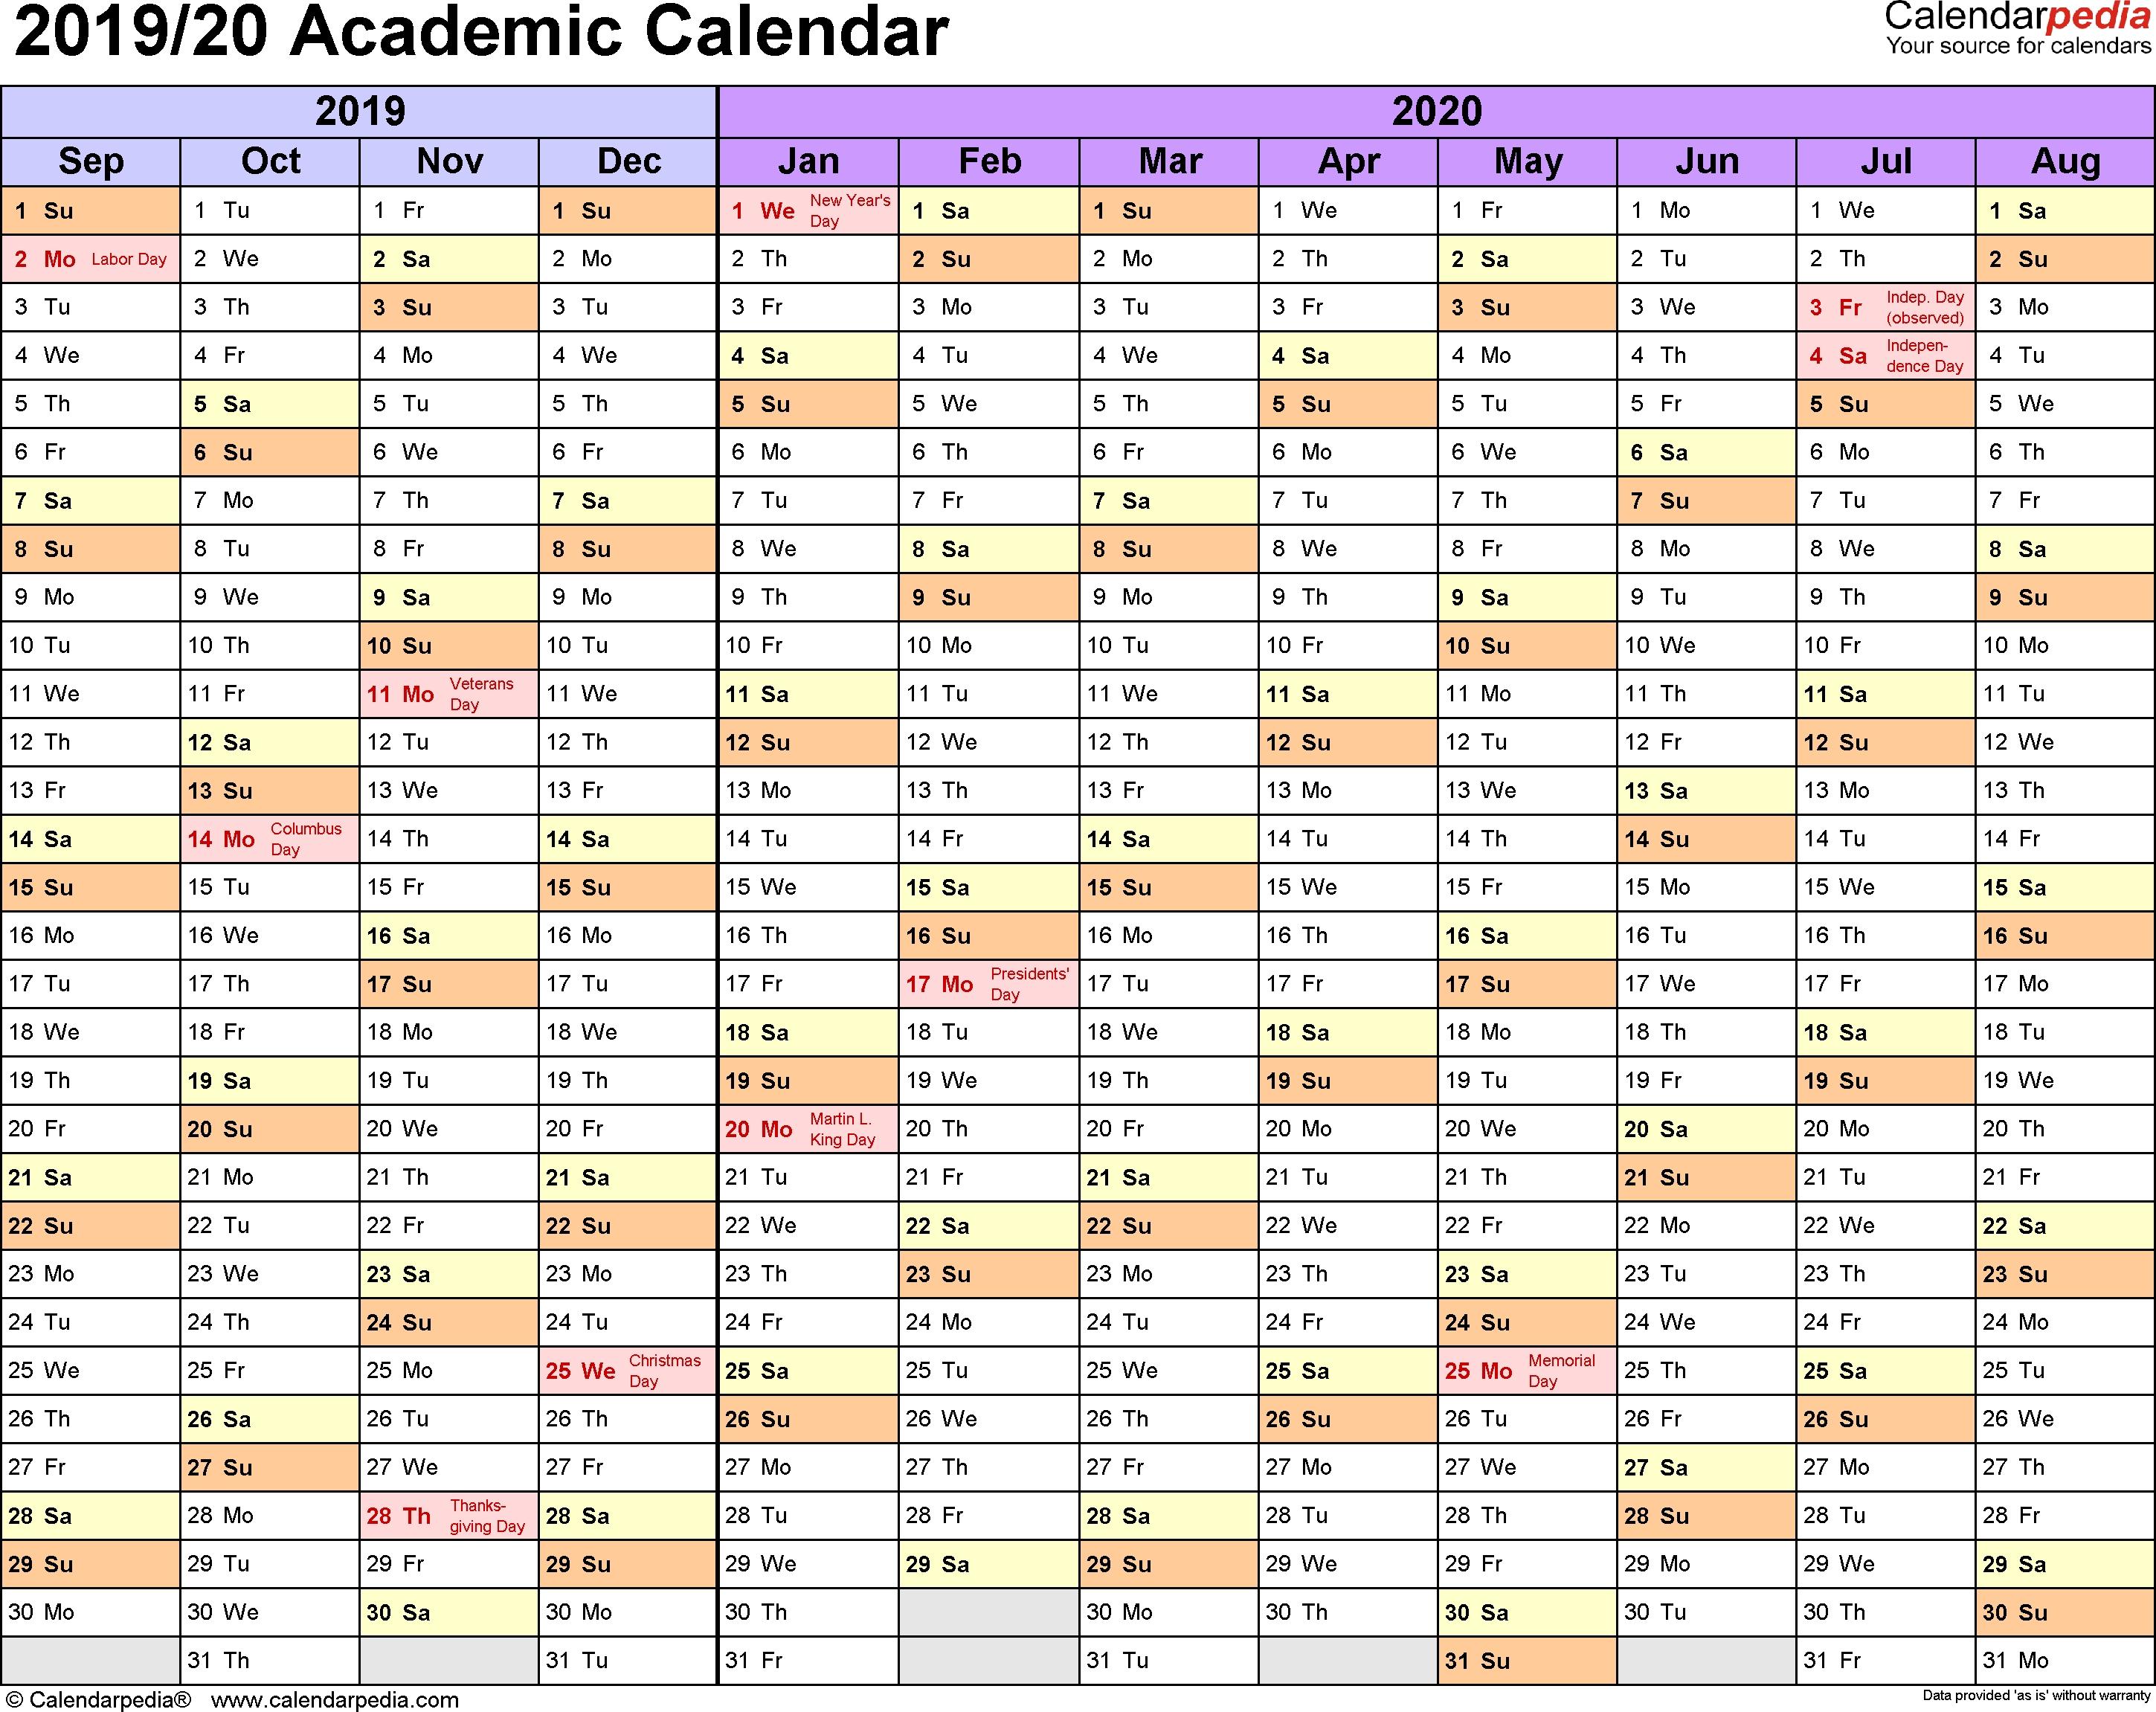 Academic Calendars 2019/2020 - Free Printable Pdf Templates for 2019-2020 Vacation Calendar